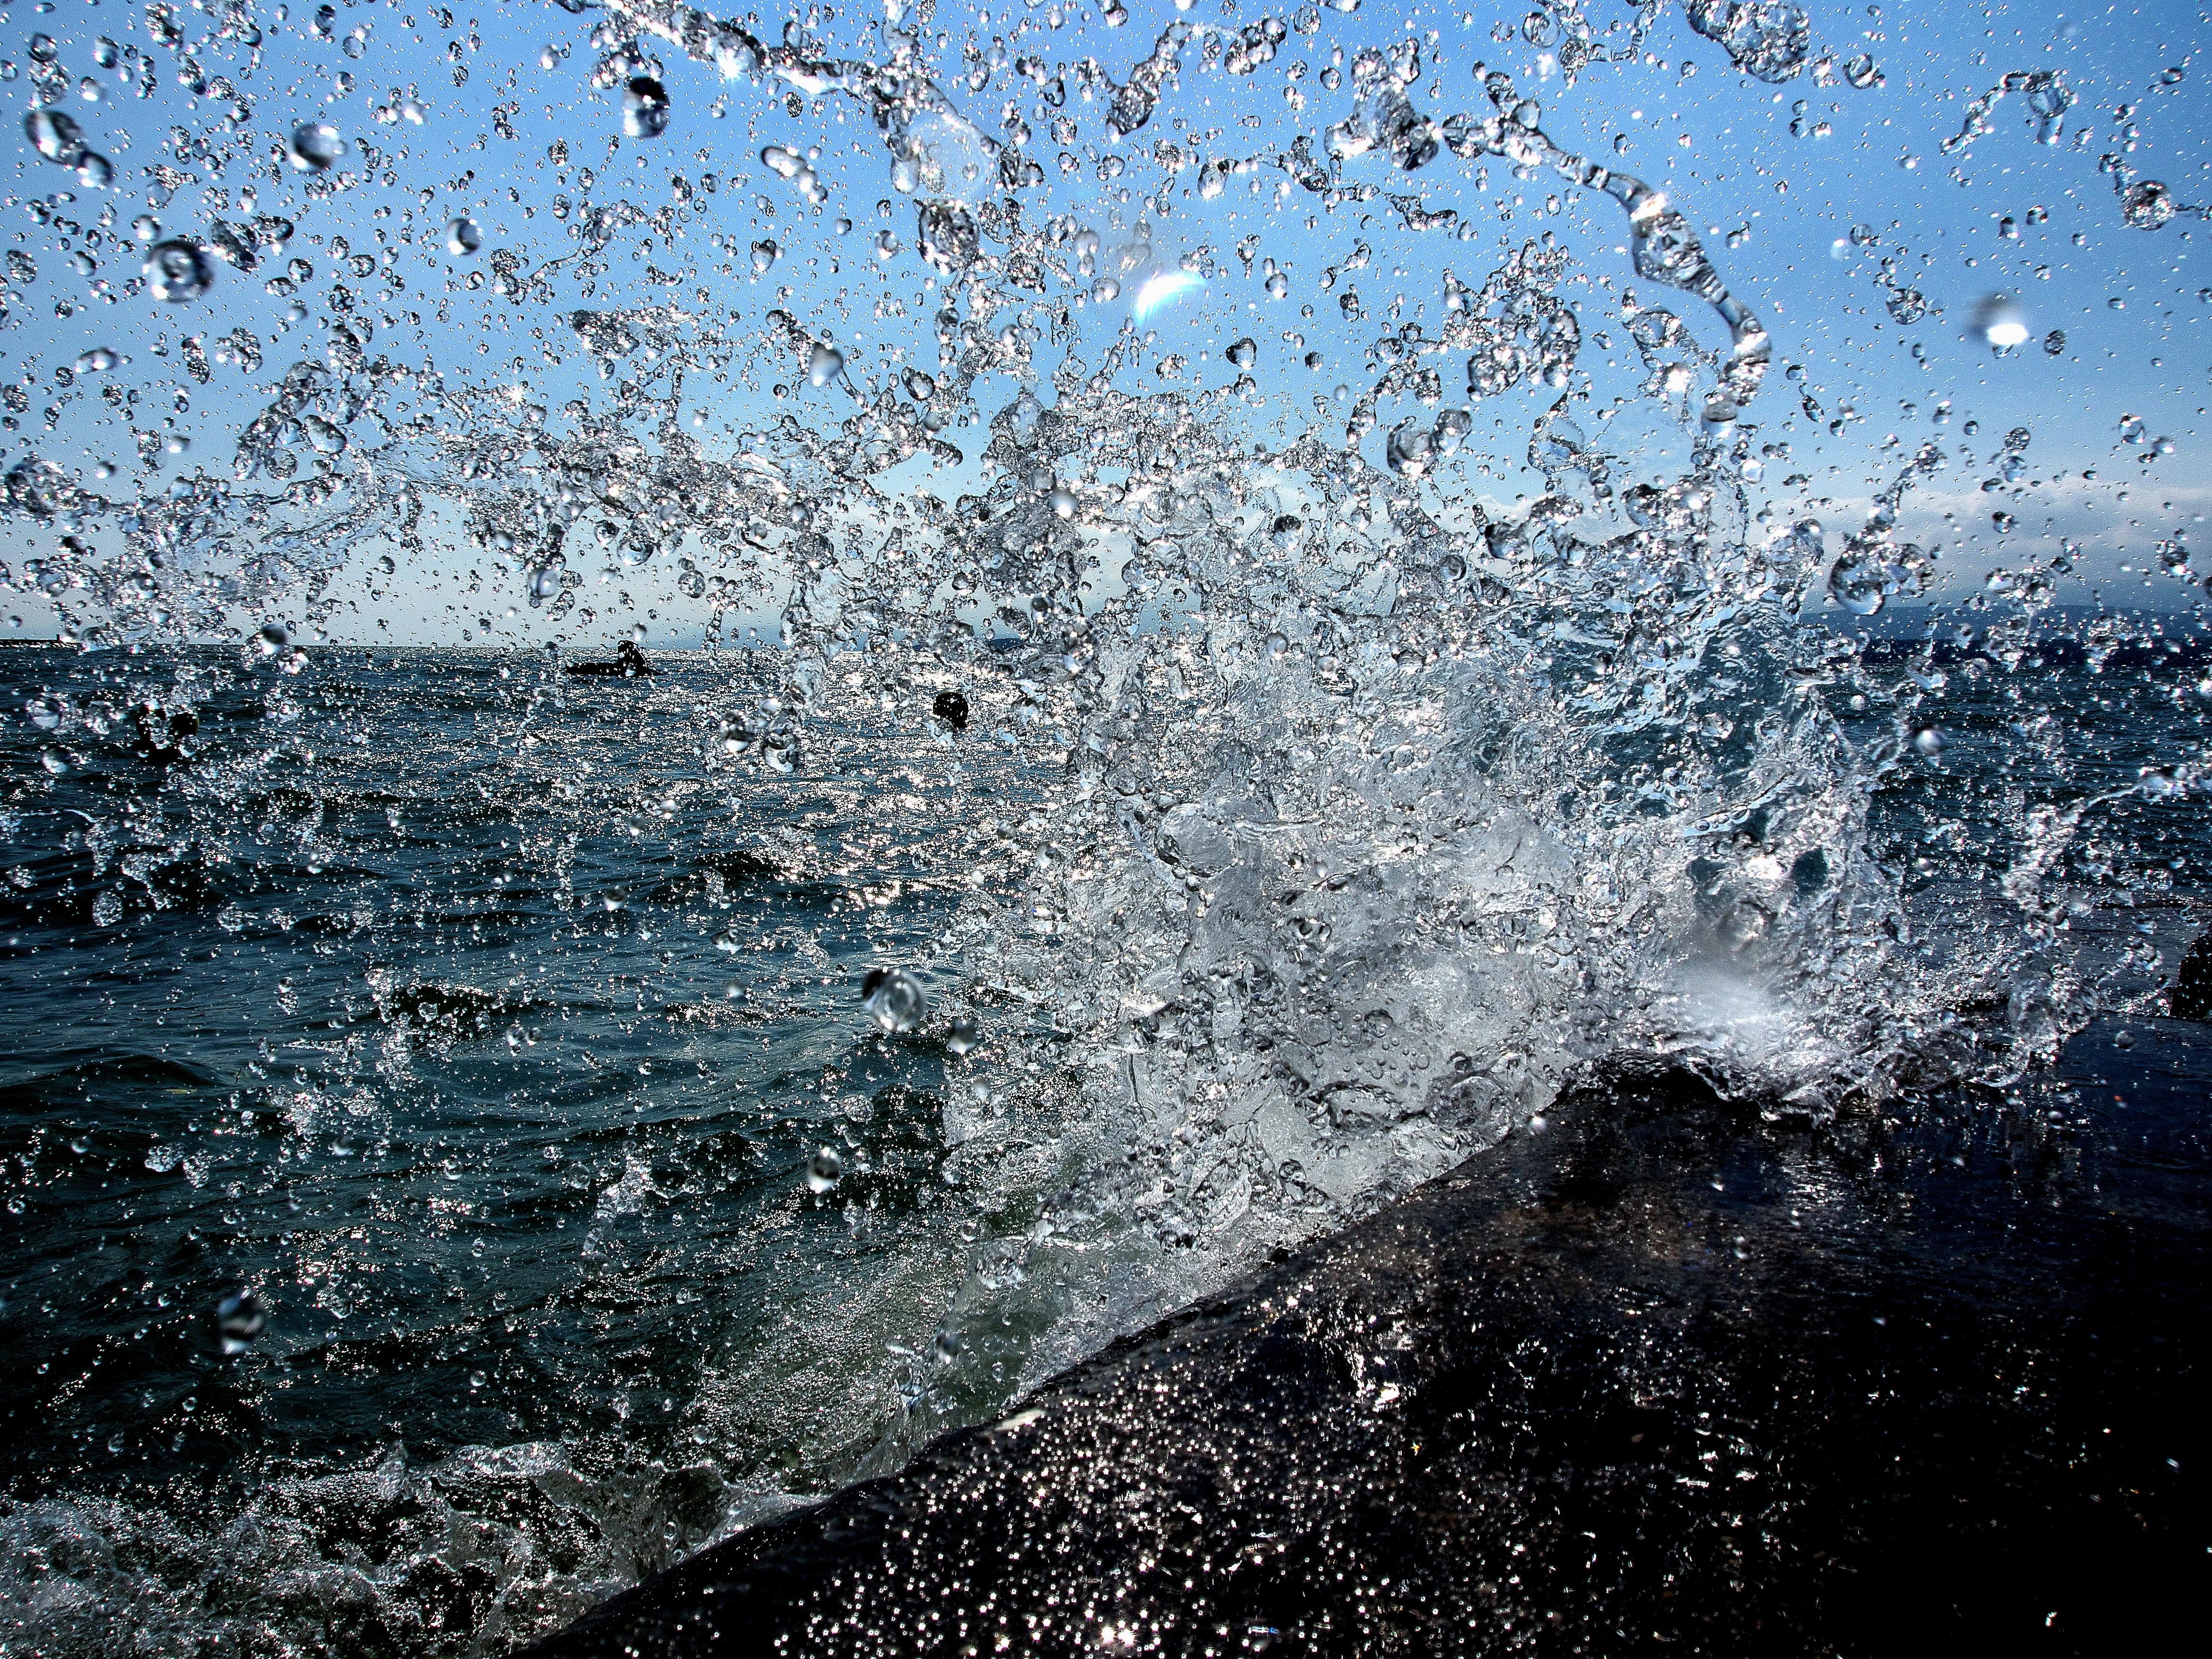 FreeUse - Sea wave lake water drops high quality photo